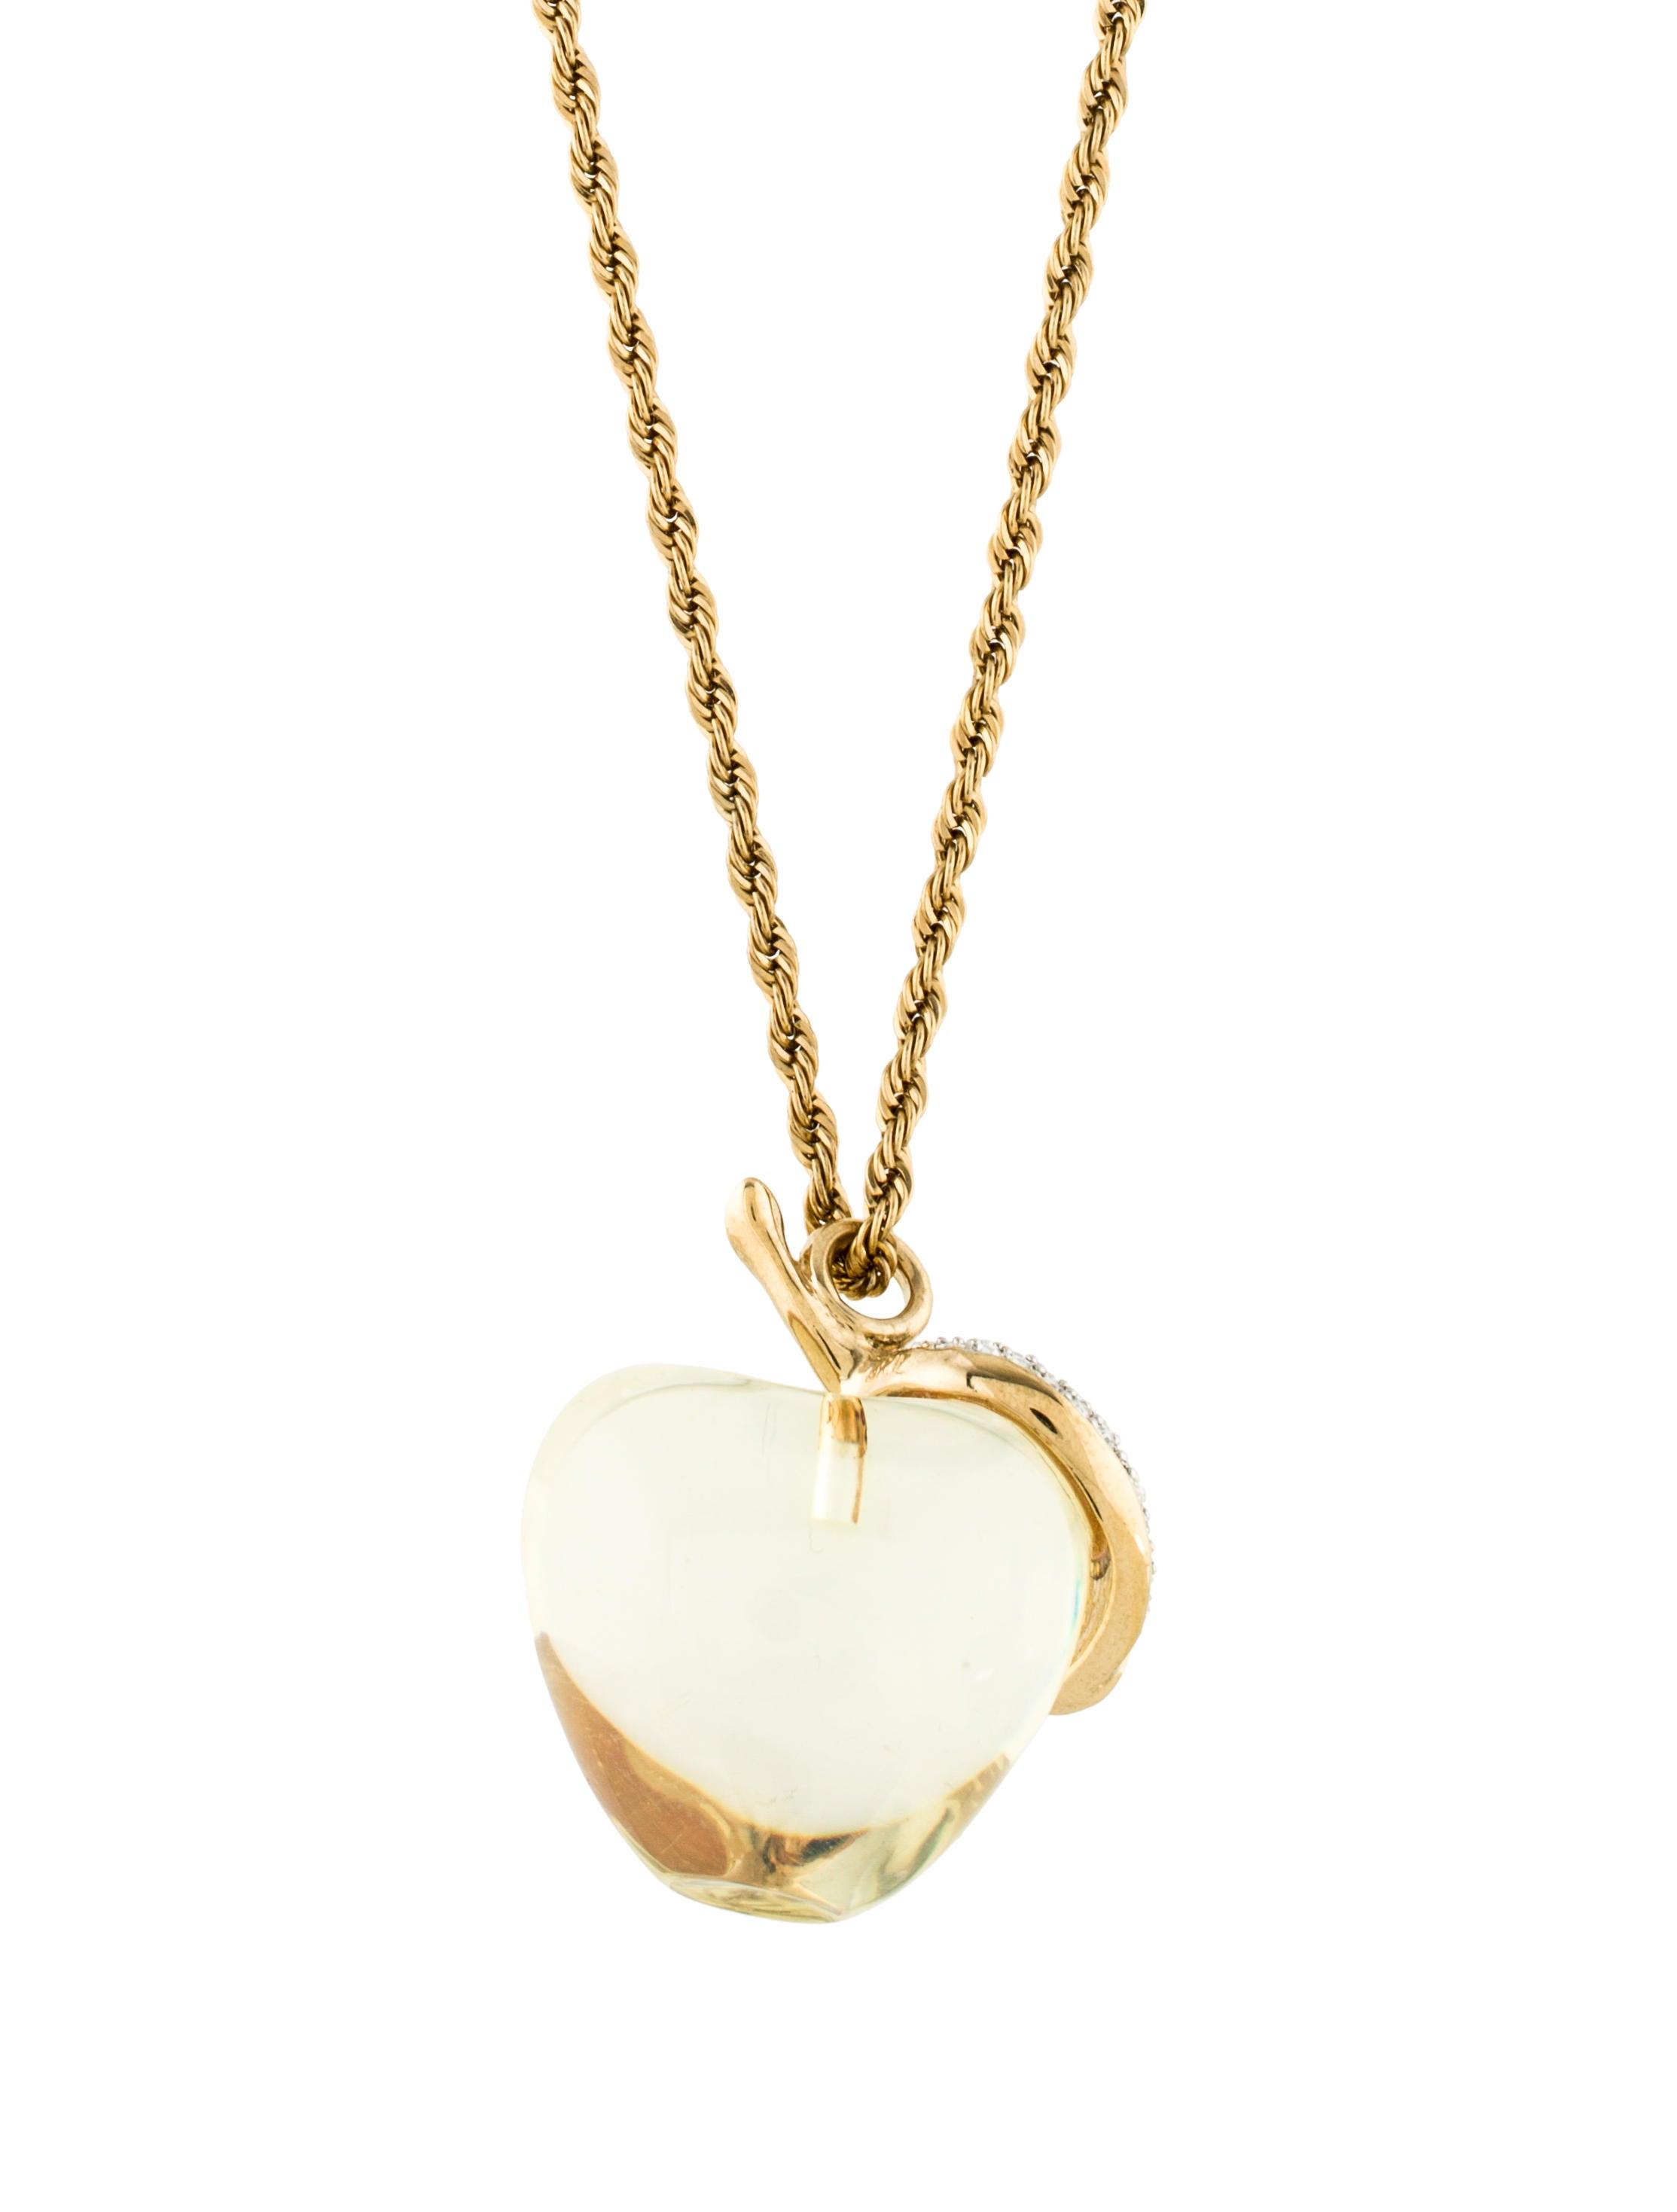 Kenneth jay lane apple pendant necklace necklaces wke22428 the apple pendant necklace aloadofball Gallery